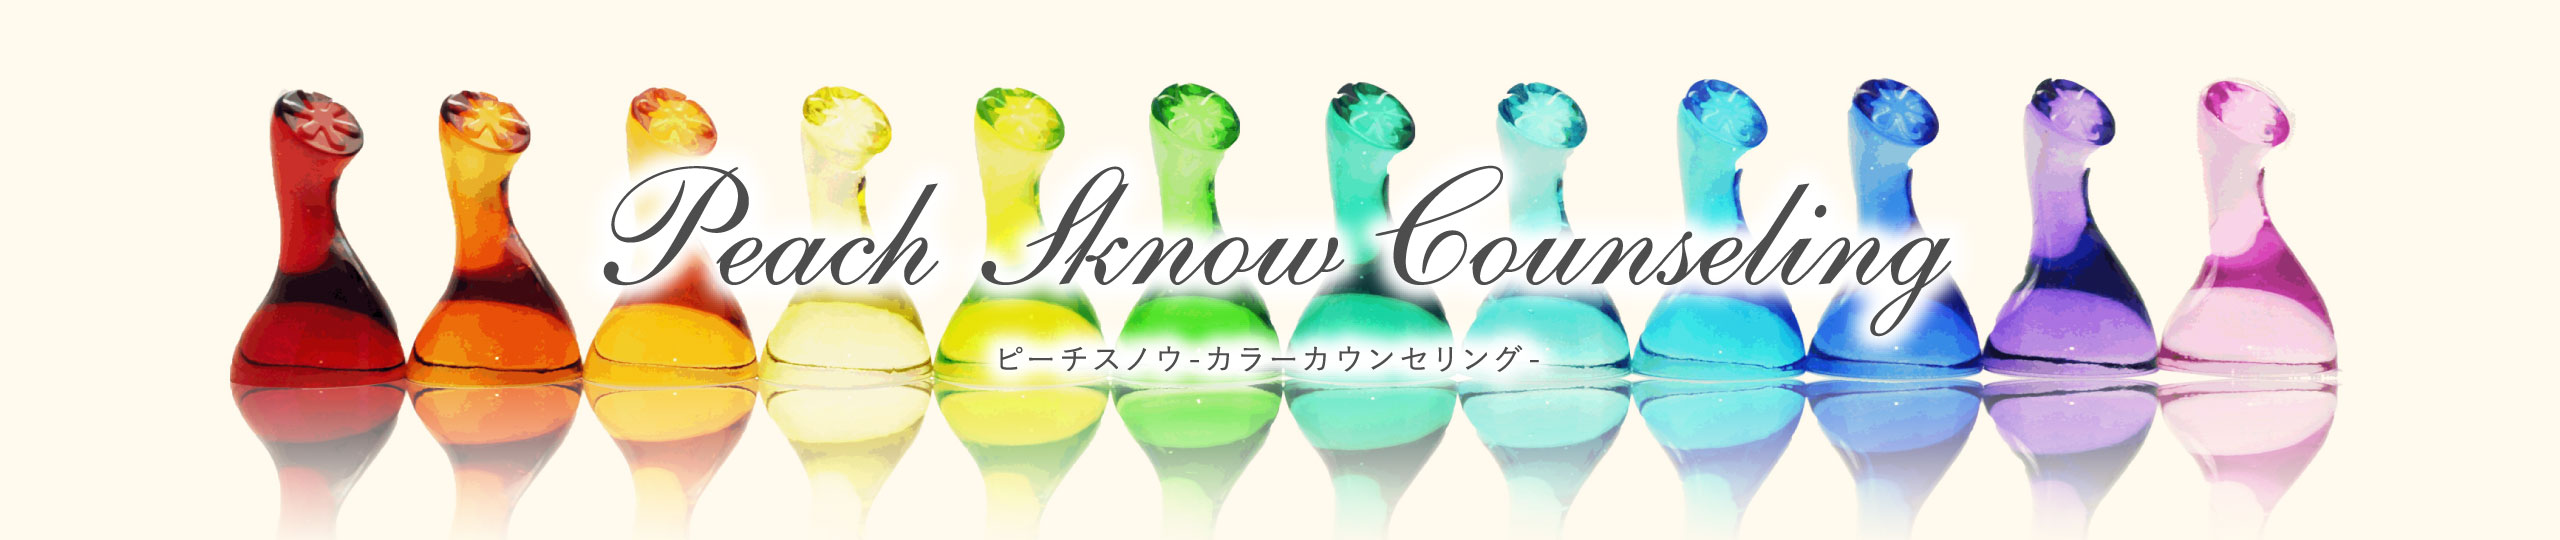 Peach Sknow Counseling ピーチスノウ-カラーカウンセリング-